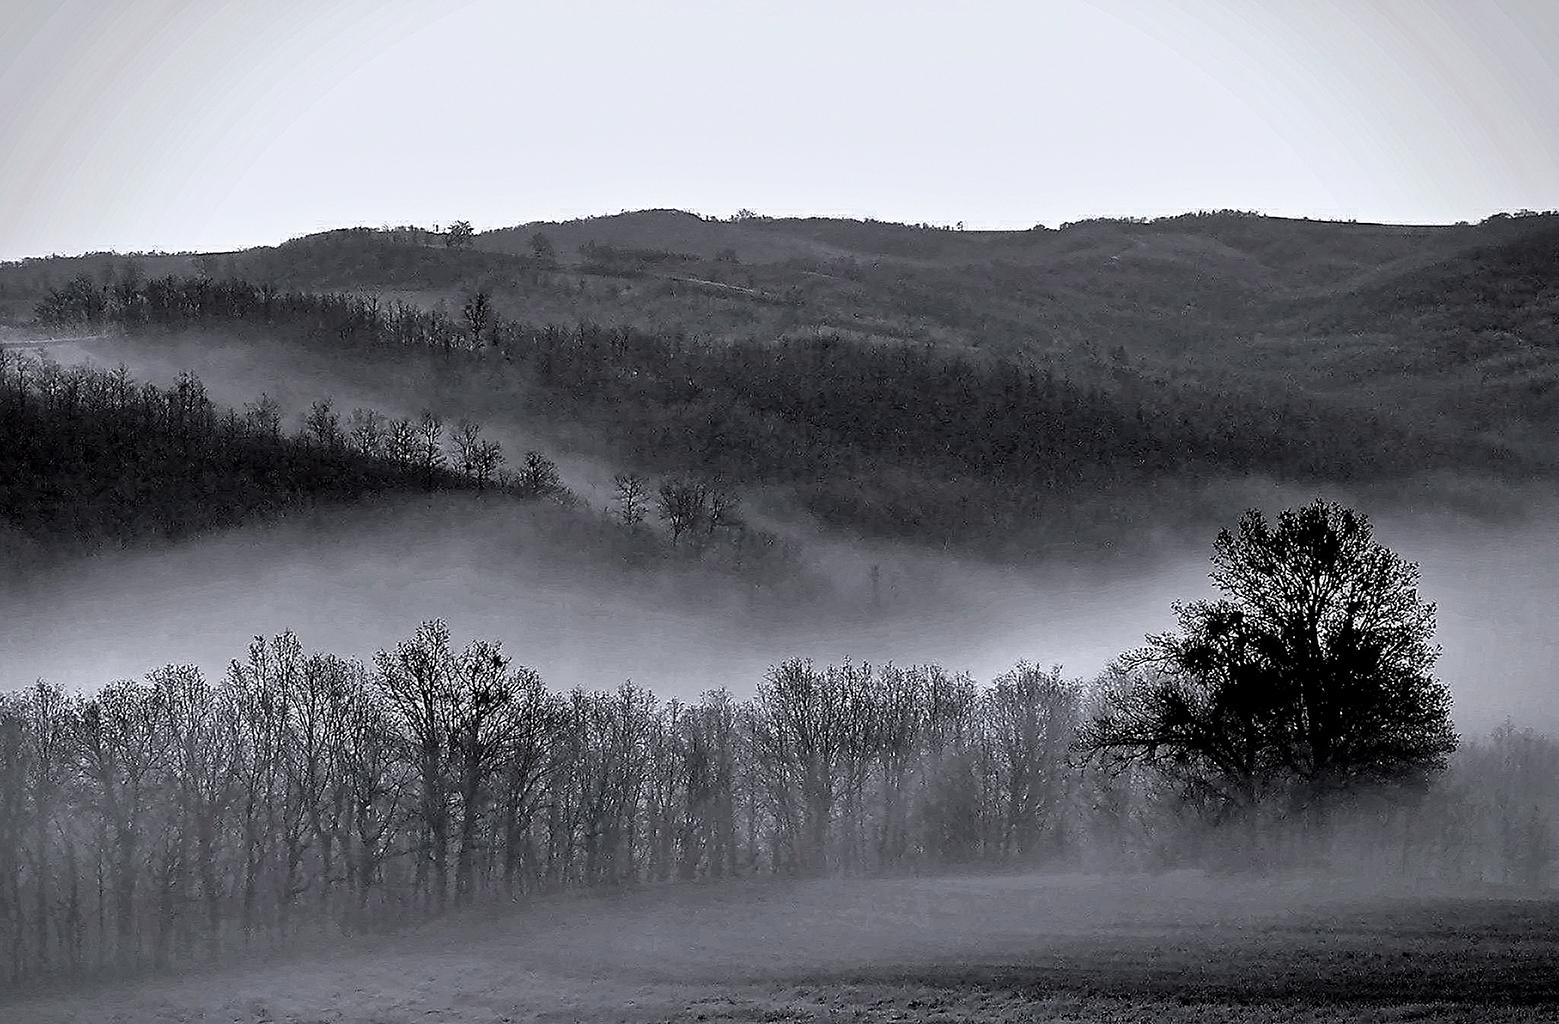 Morning mist, Greece...